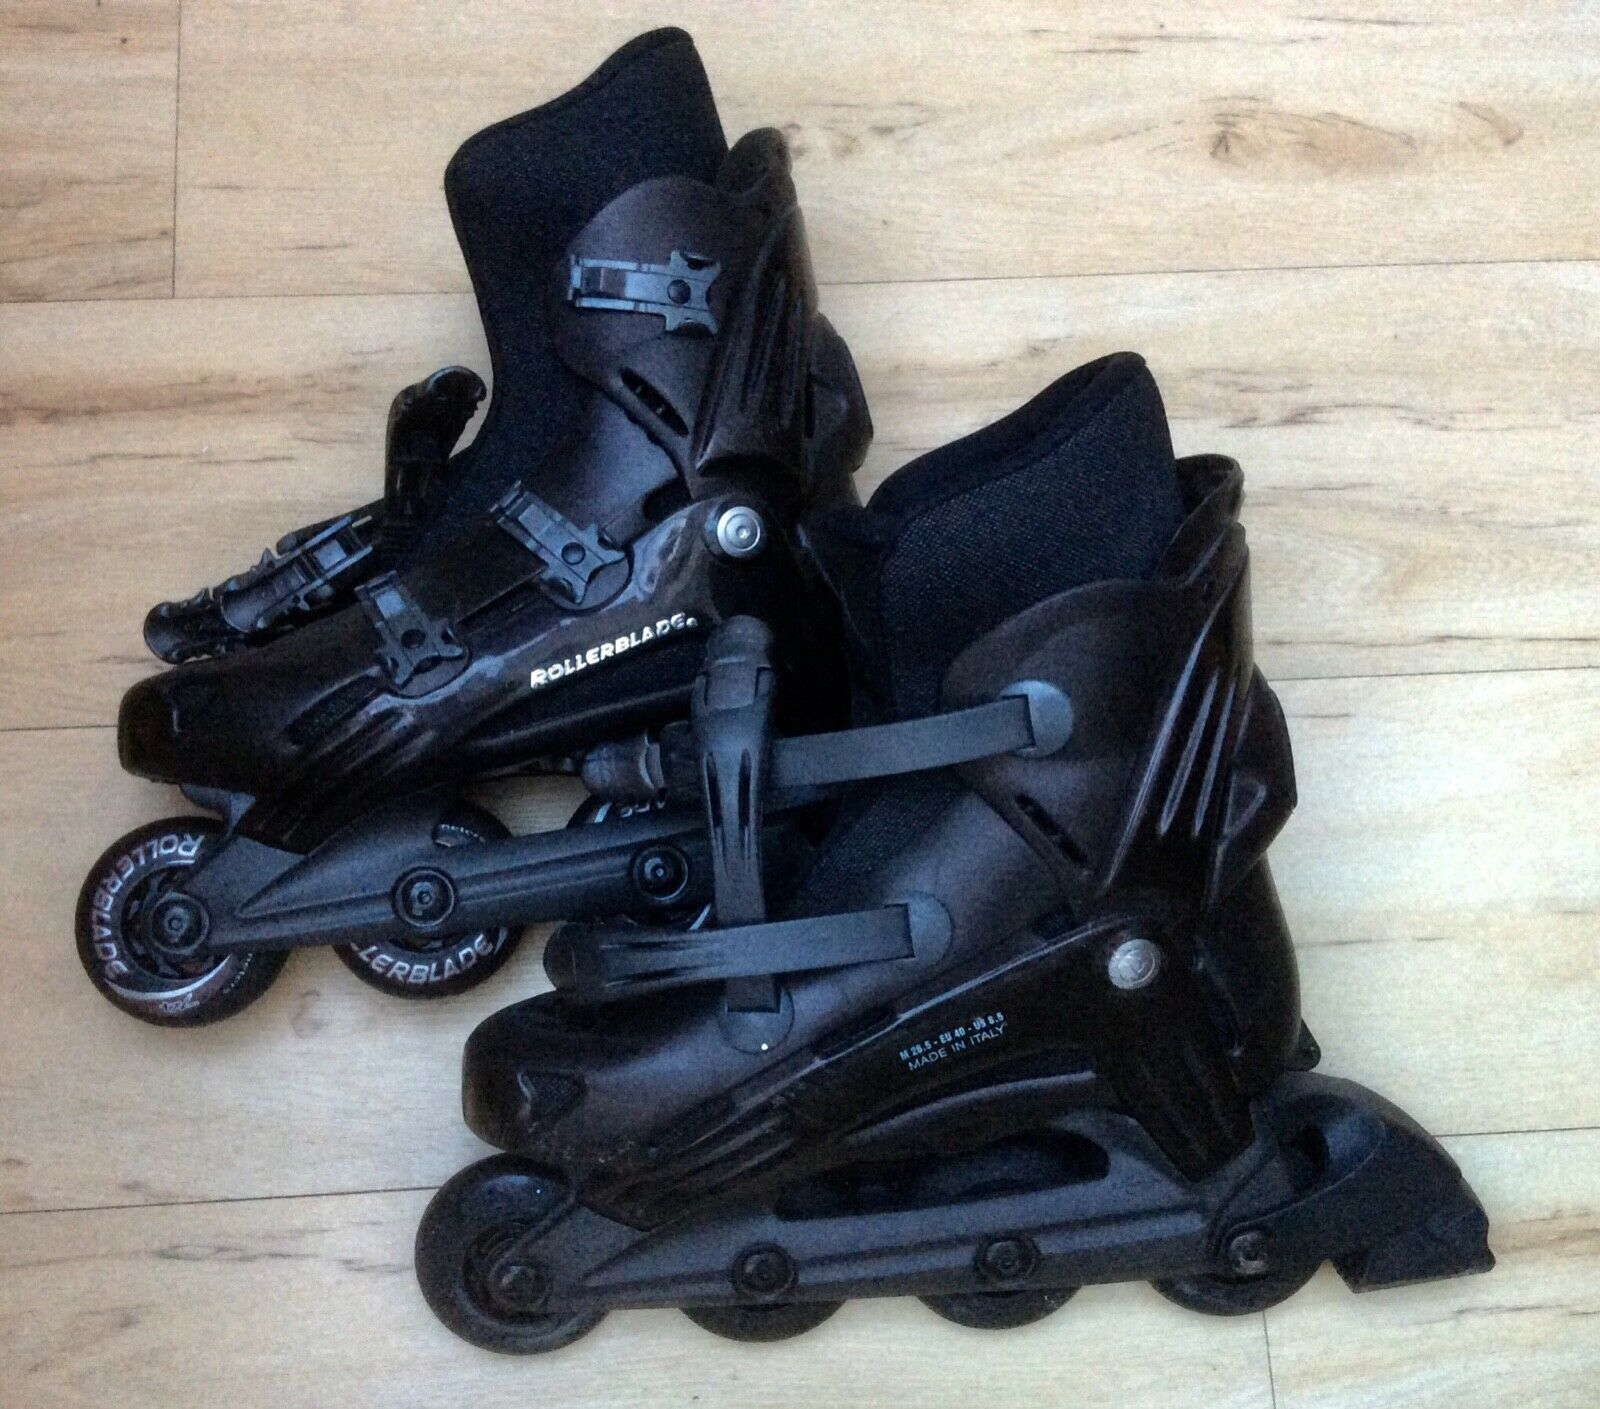 Viablade ABEC Made in  Men's Roller Blades M26.5, US 8.5